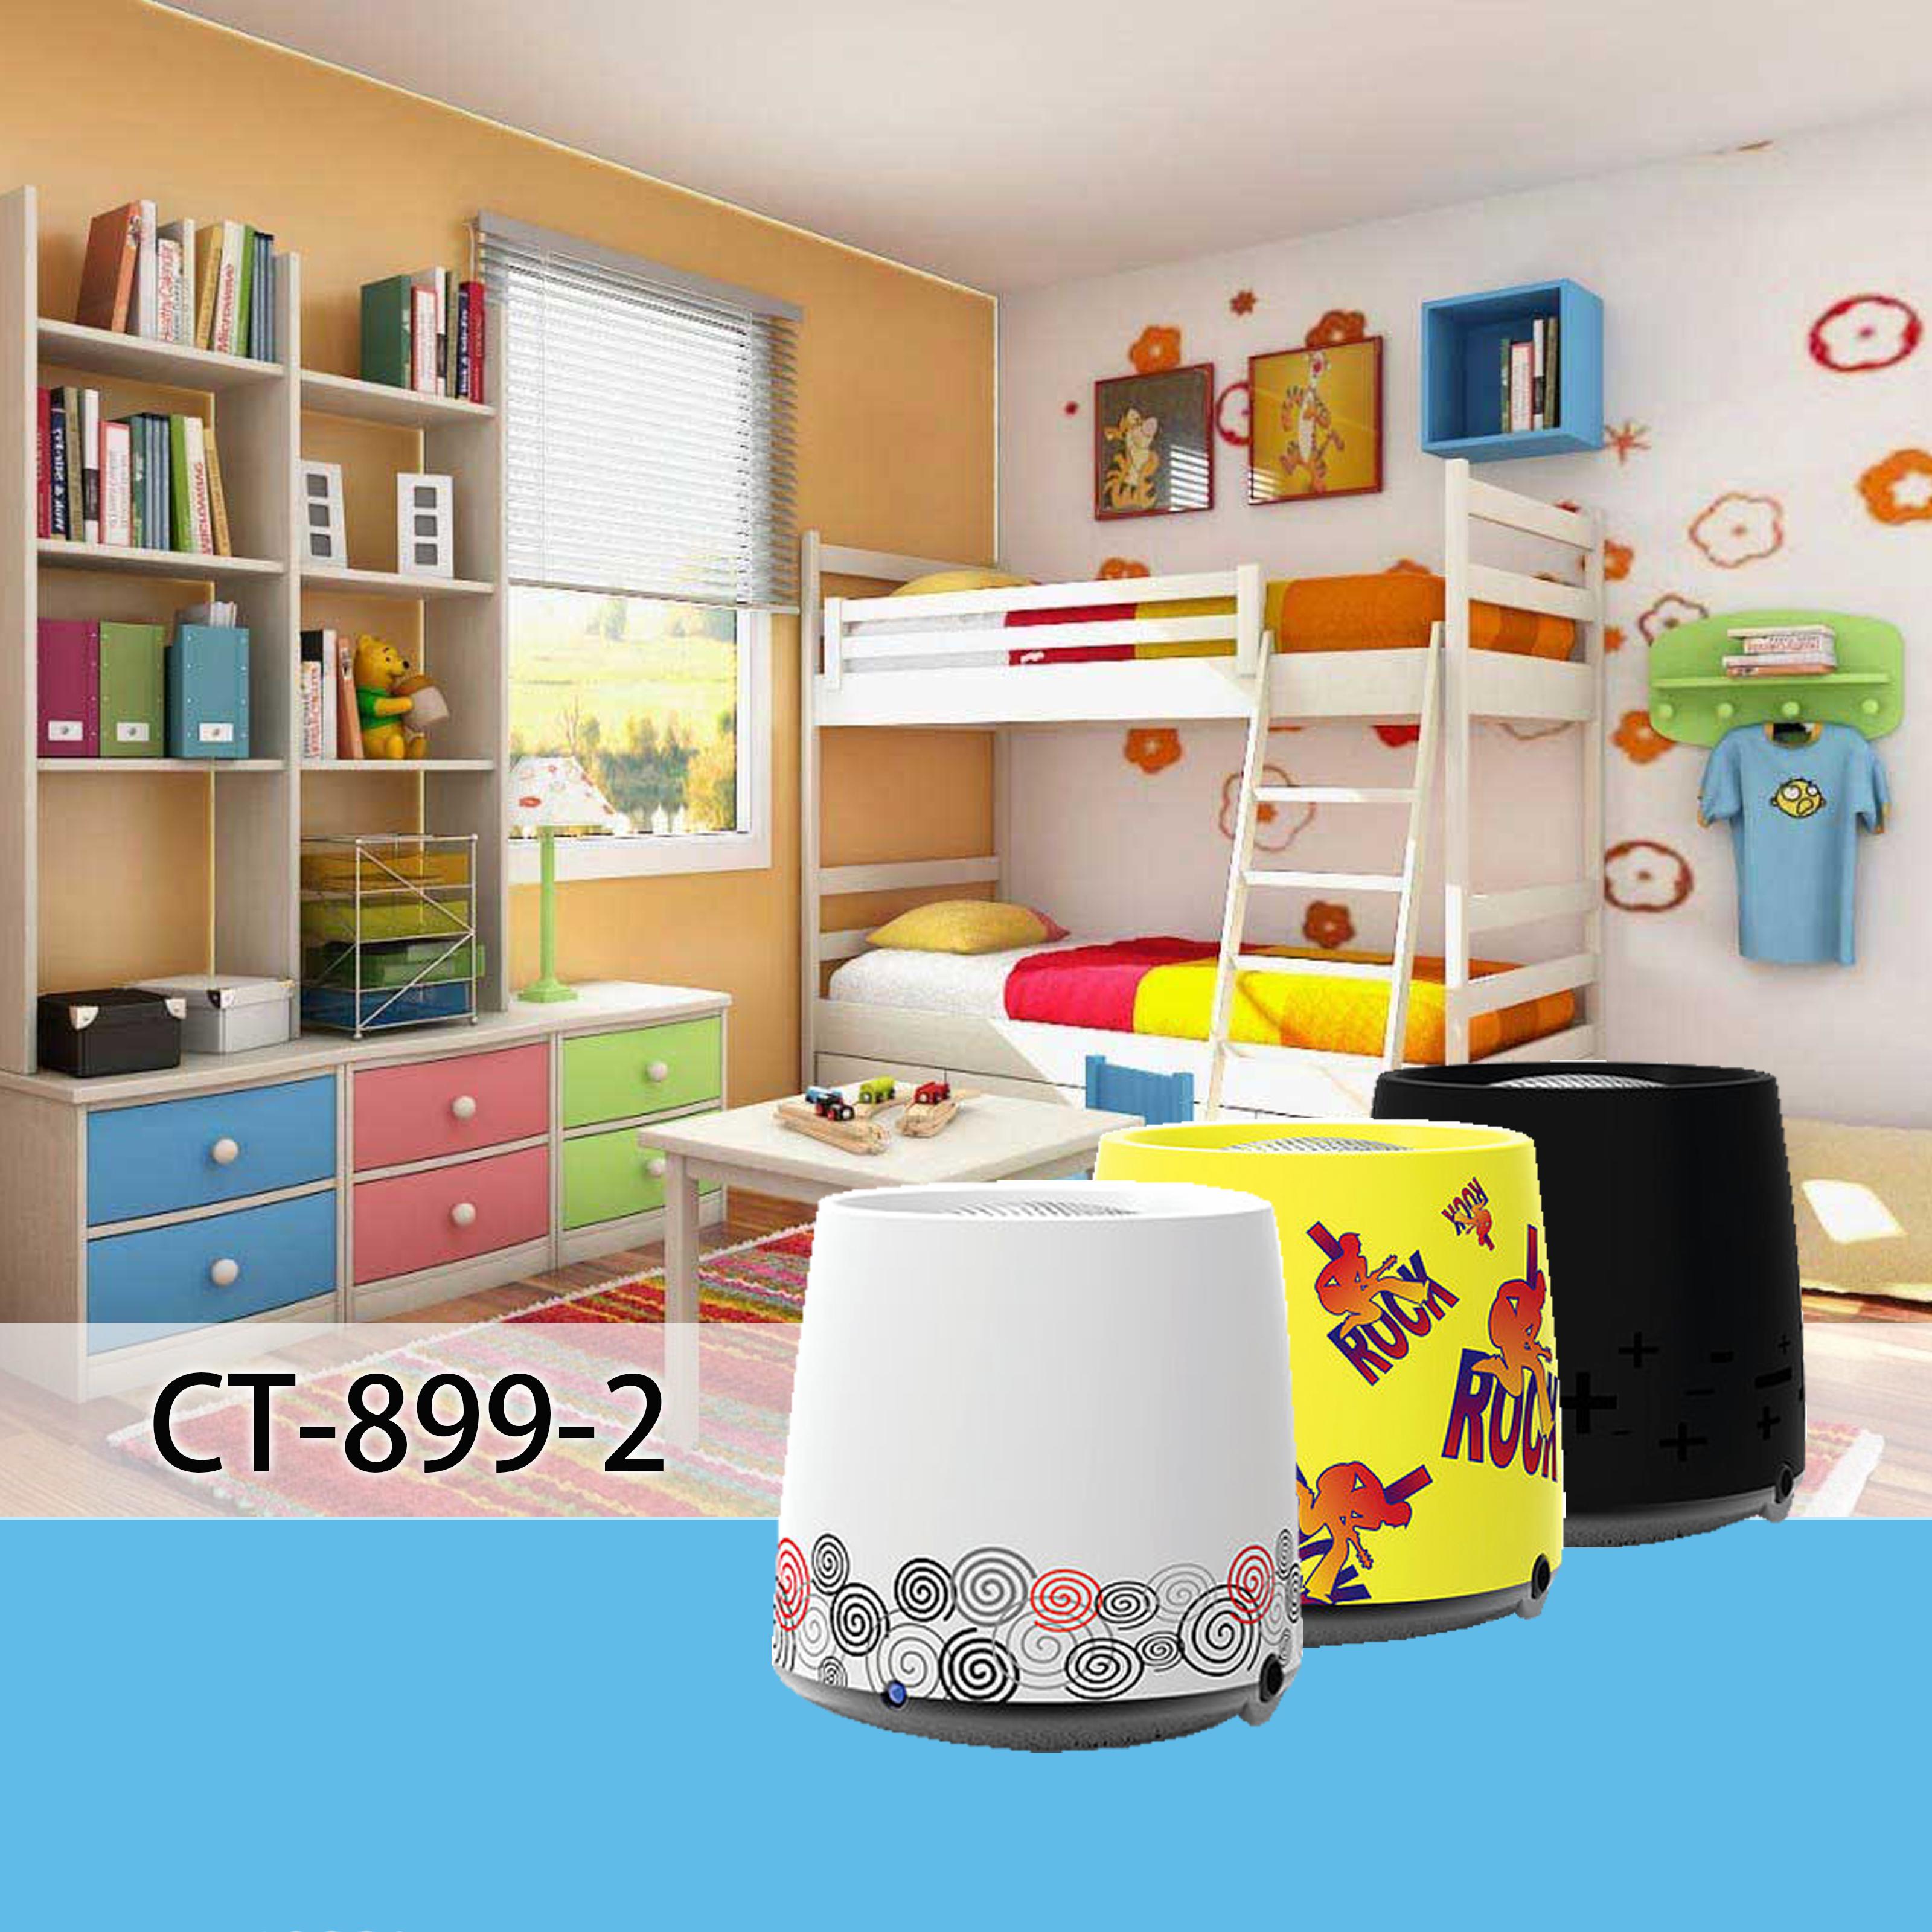 CT-899-2 kids bedroom.jpg